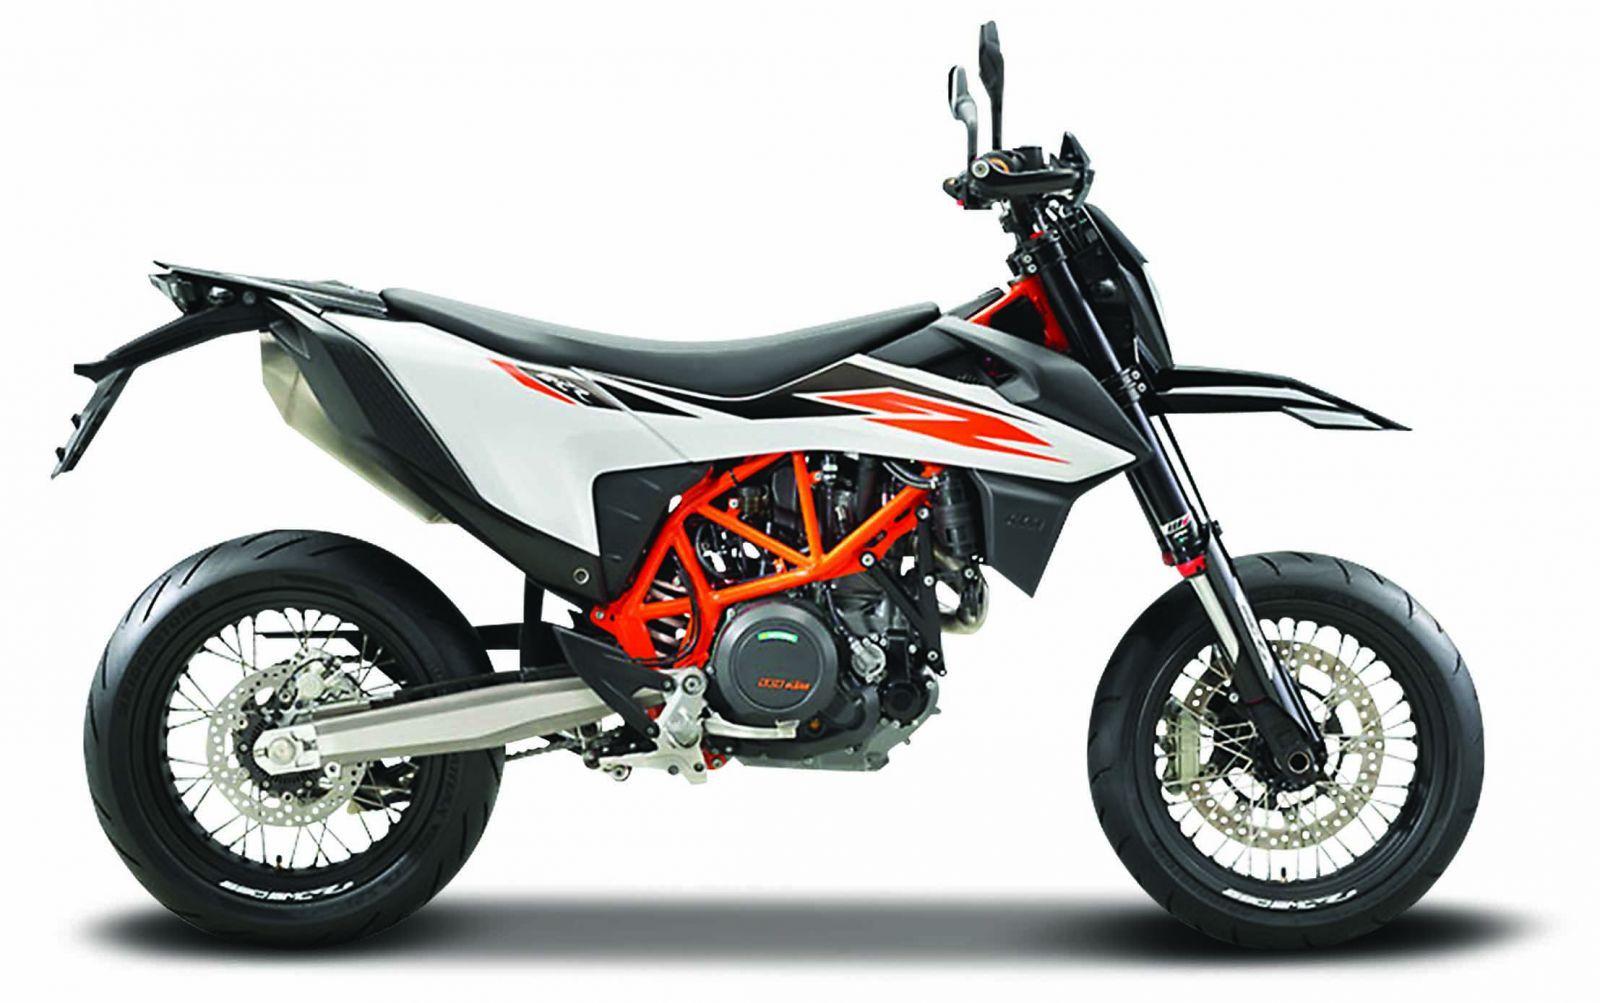 Maisto motorka bez podstavce - KTM 690 SMC R 1:18 bílo oranžová Miasto